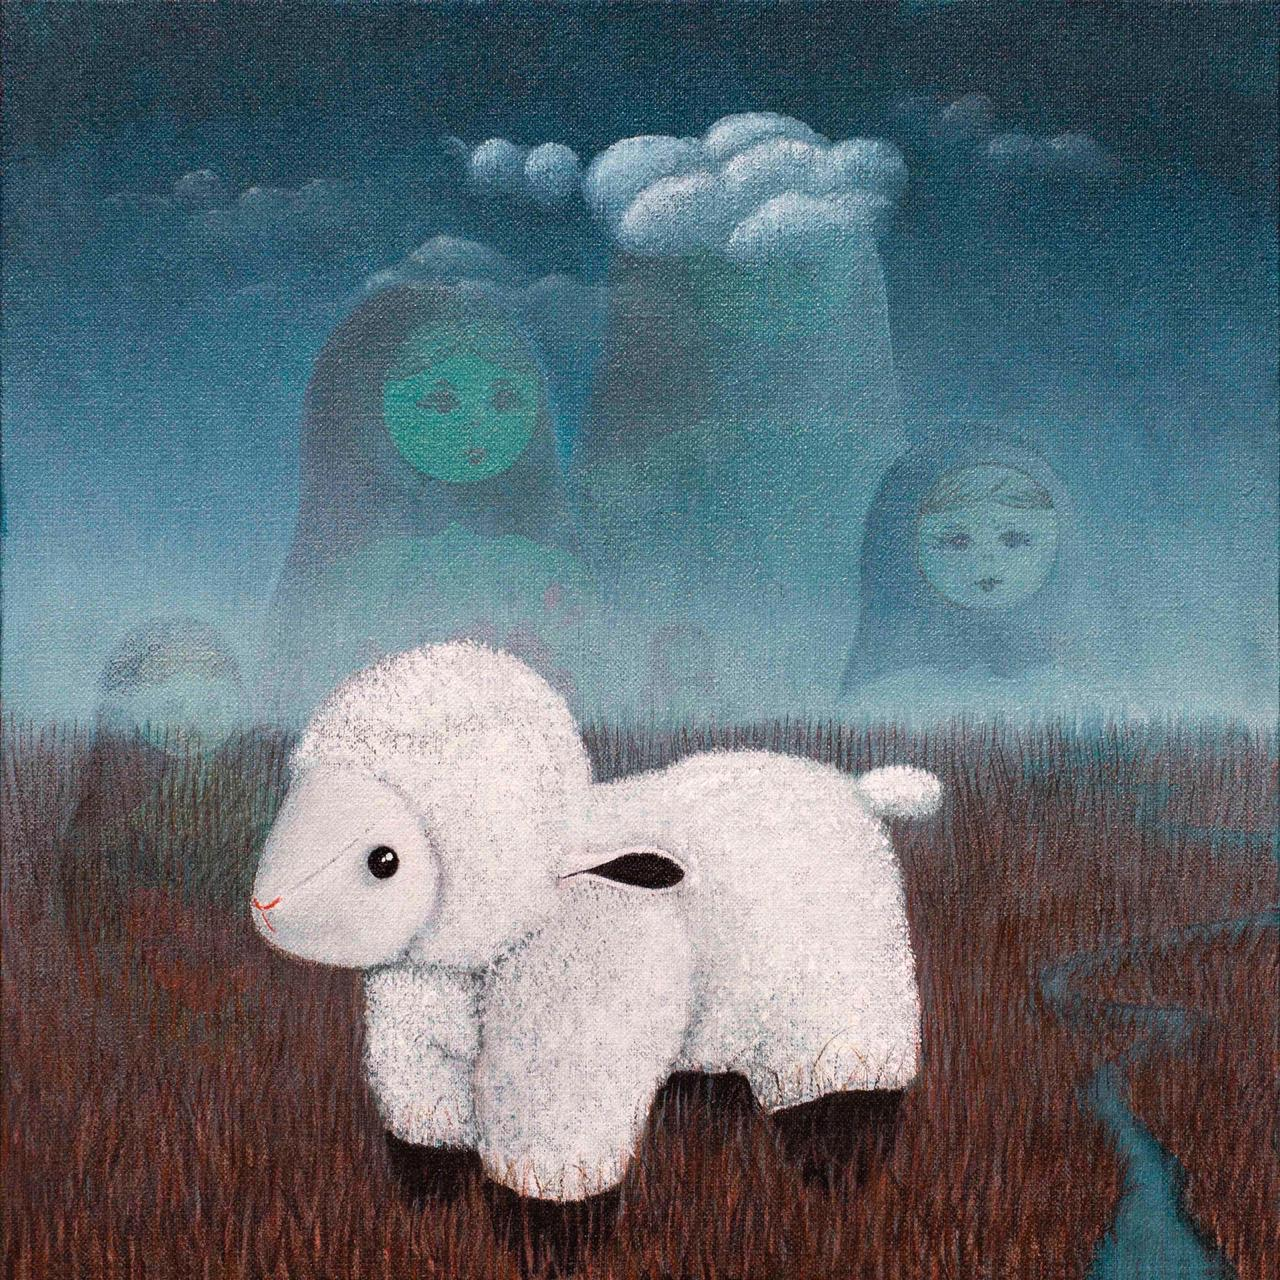 Irfan Gul Dahri<br></br>'The Lamb Story<br></br>'Acrylics on Canvas<br></br>12x12 inches